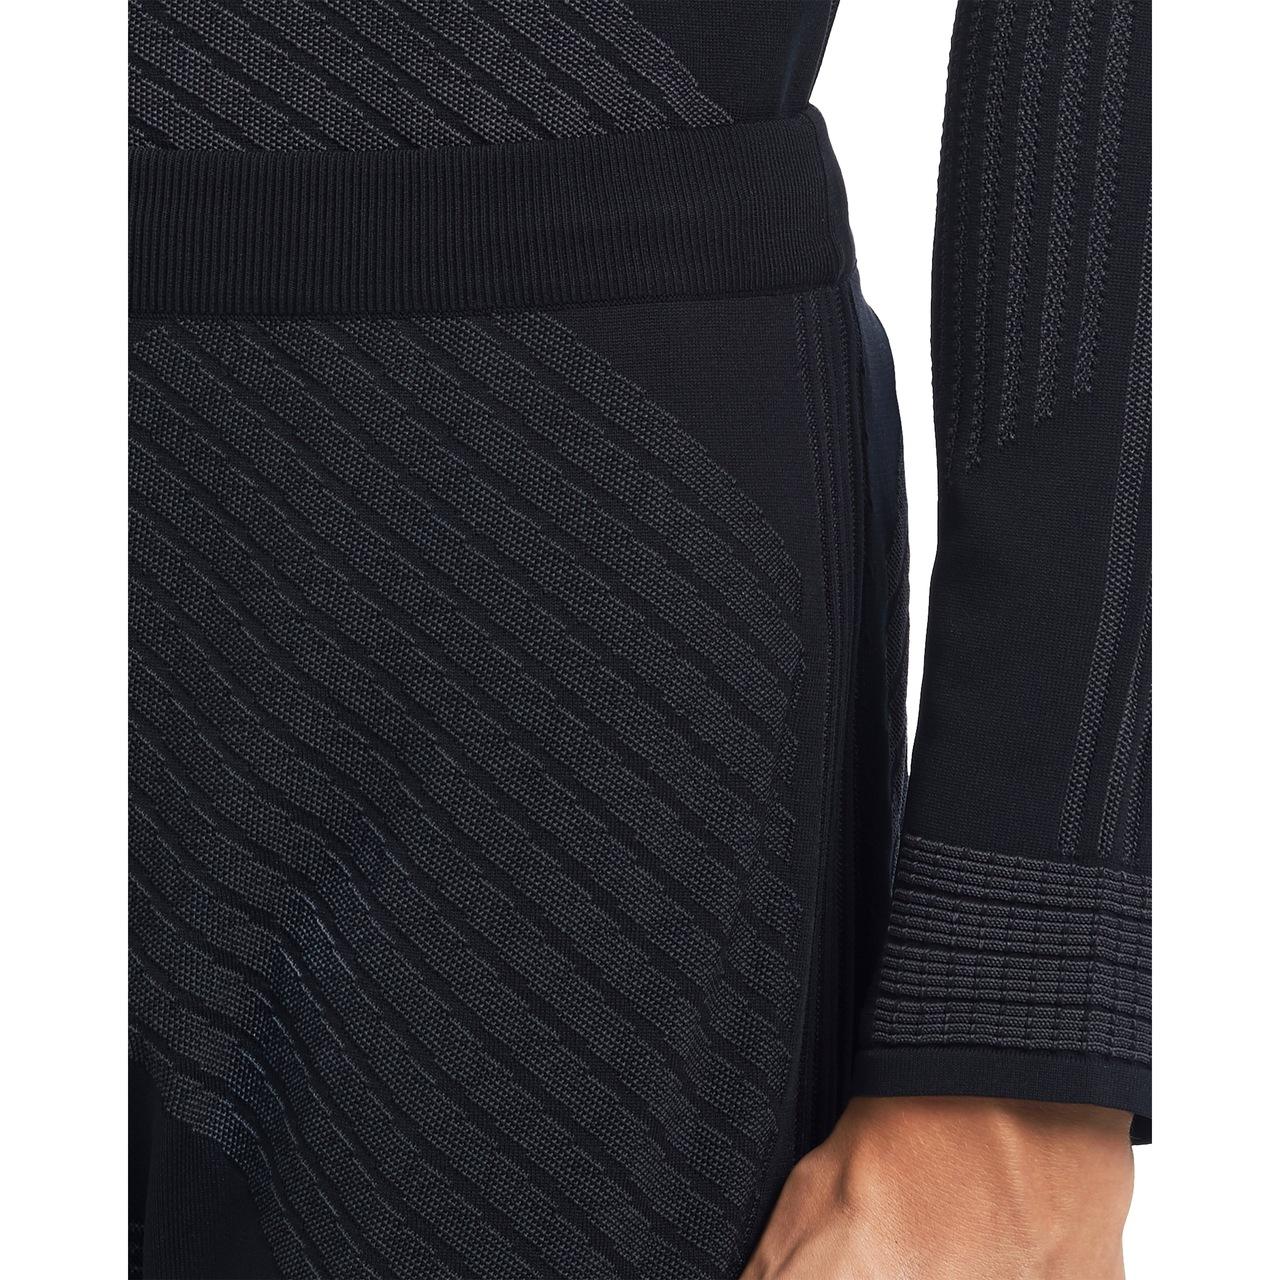 Technical Nylon trousers